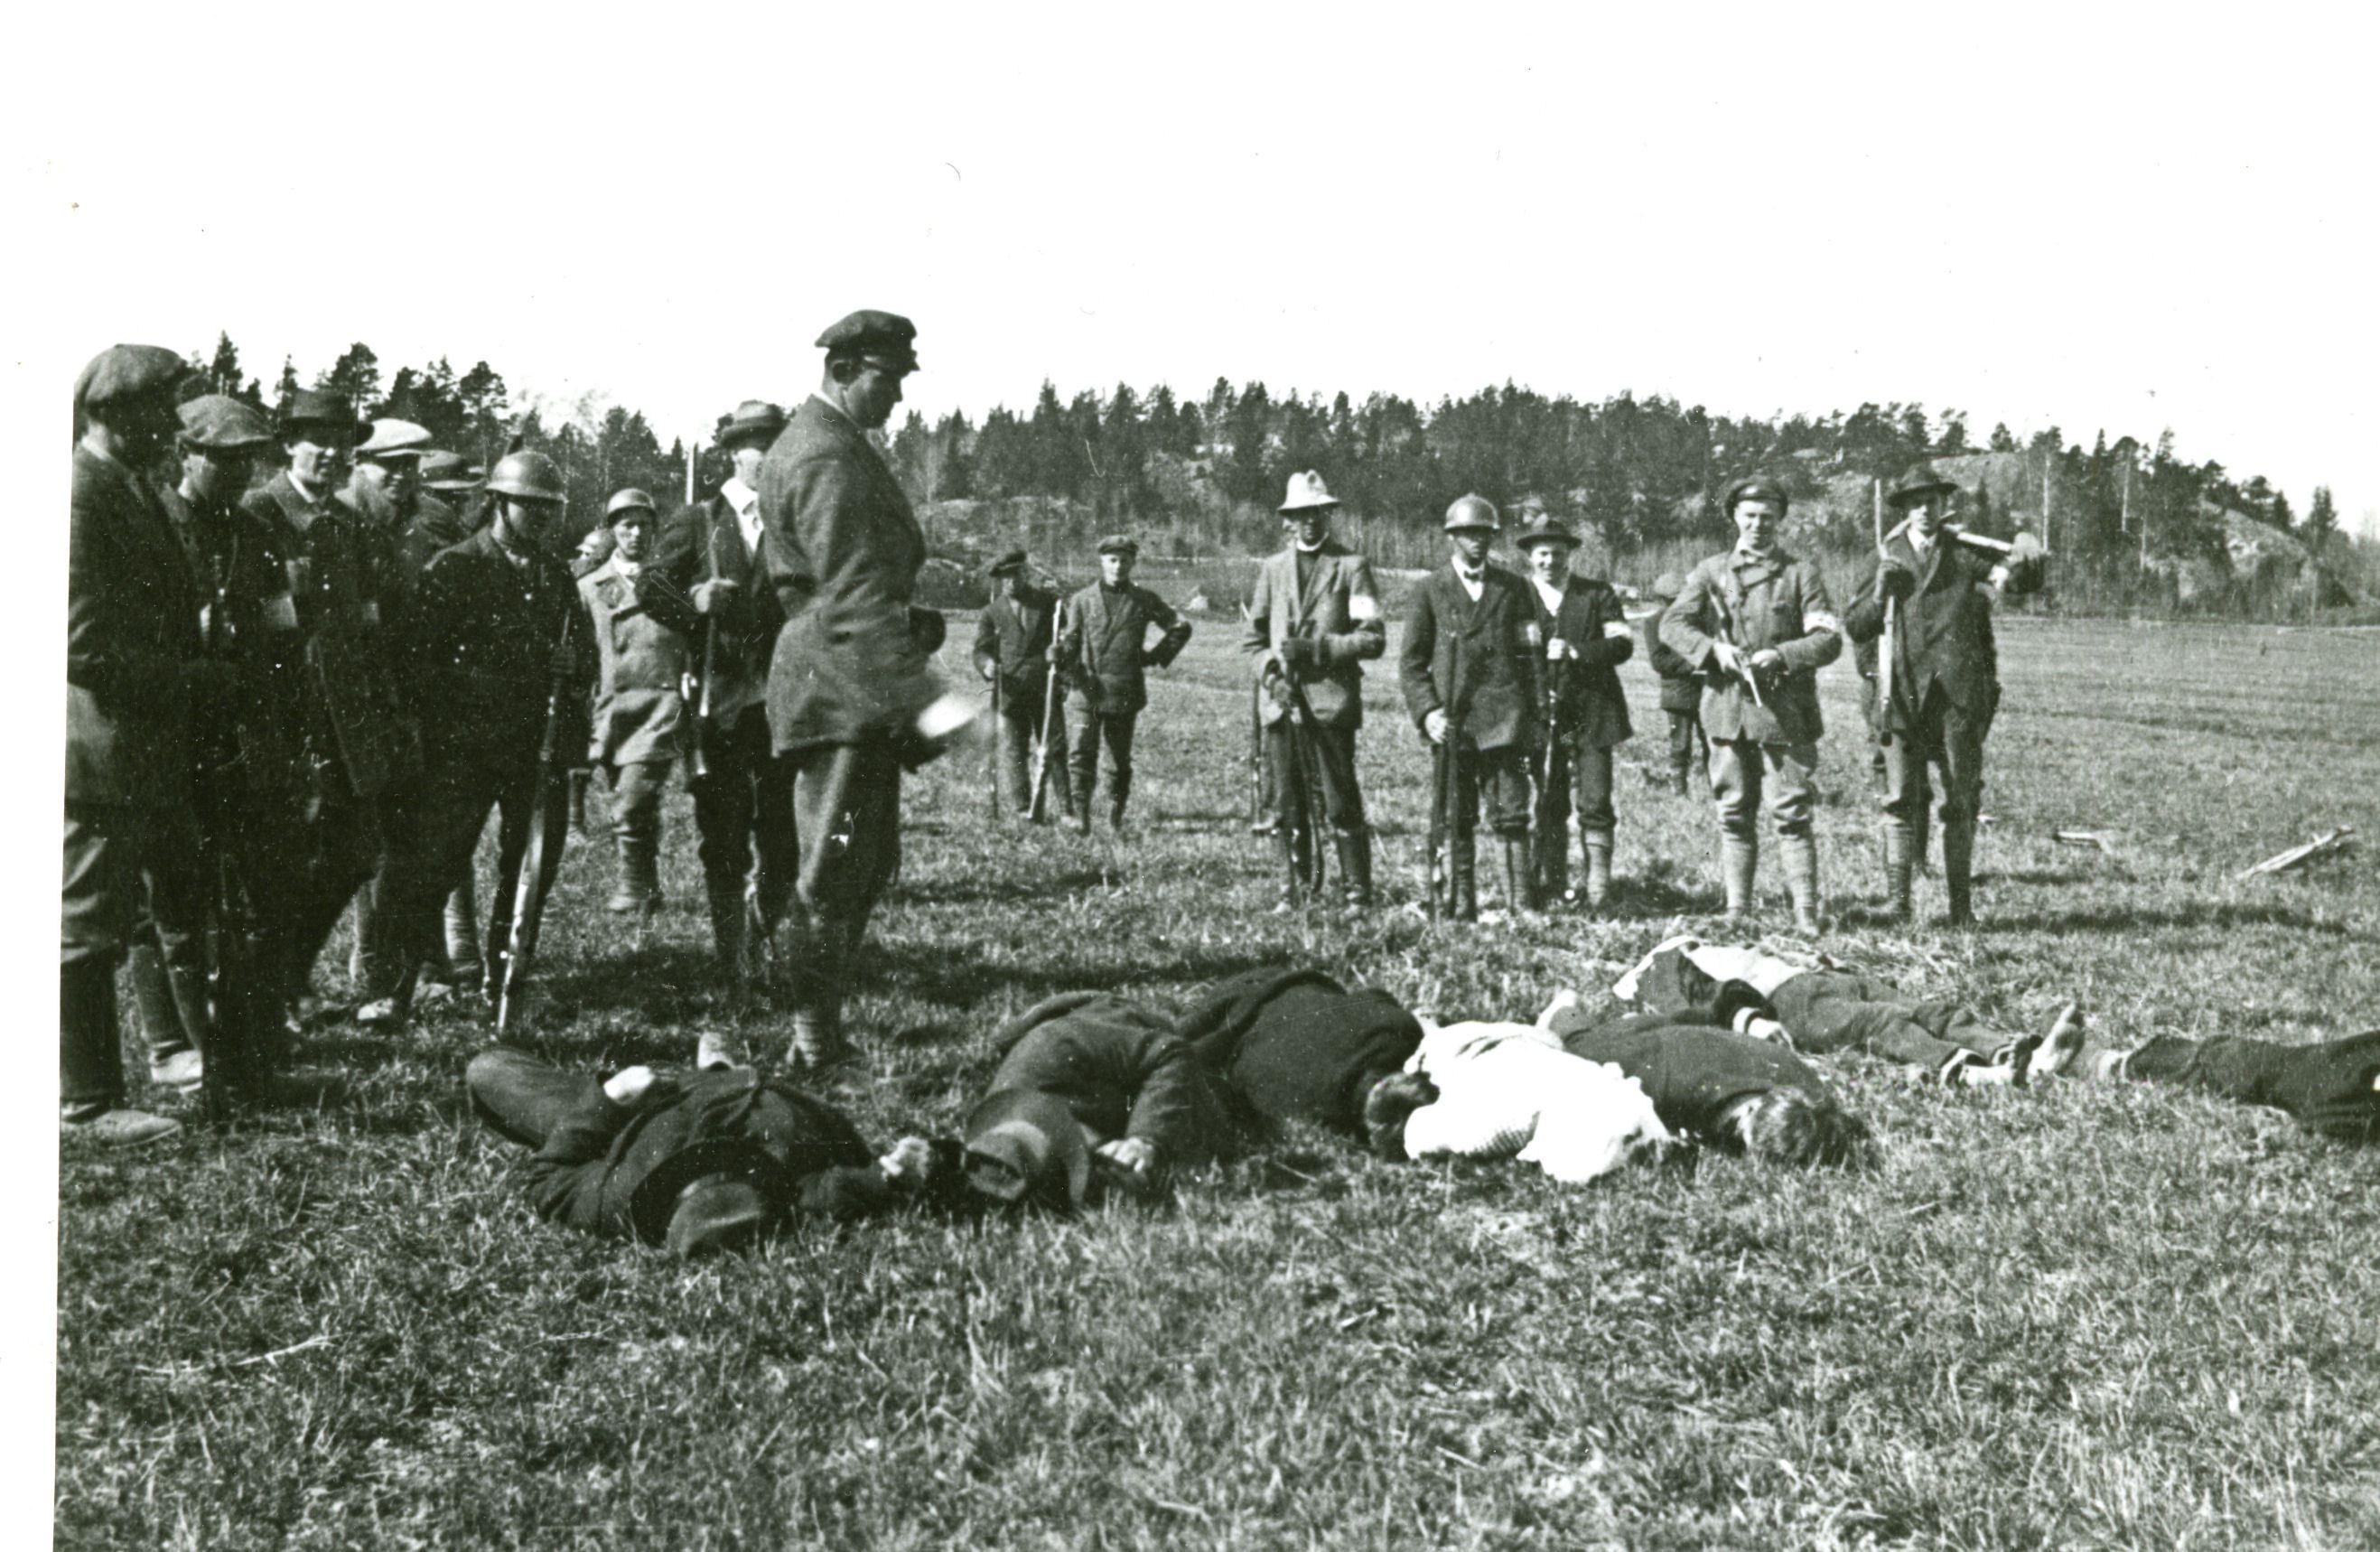 finnish-civil-war-whites-stand-over-reds.jpg